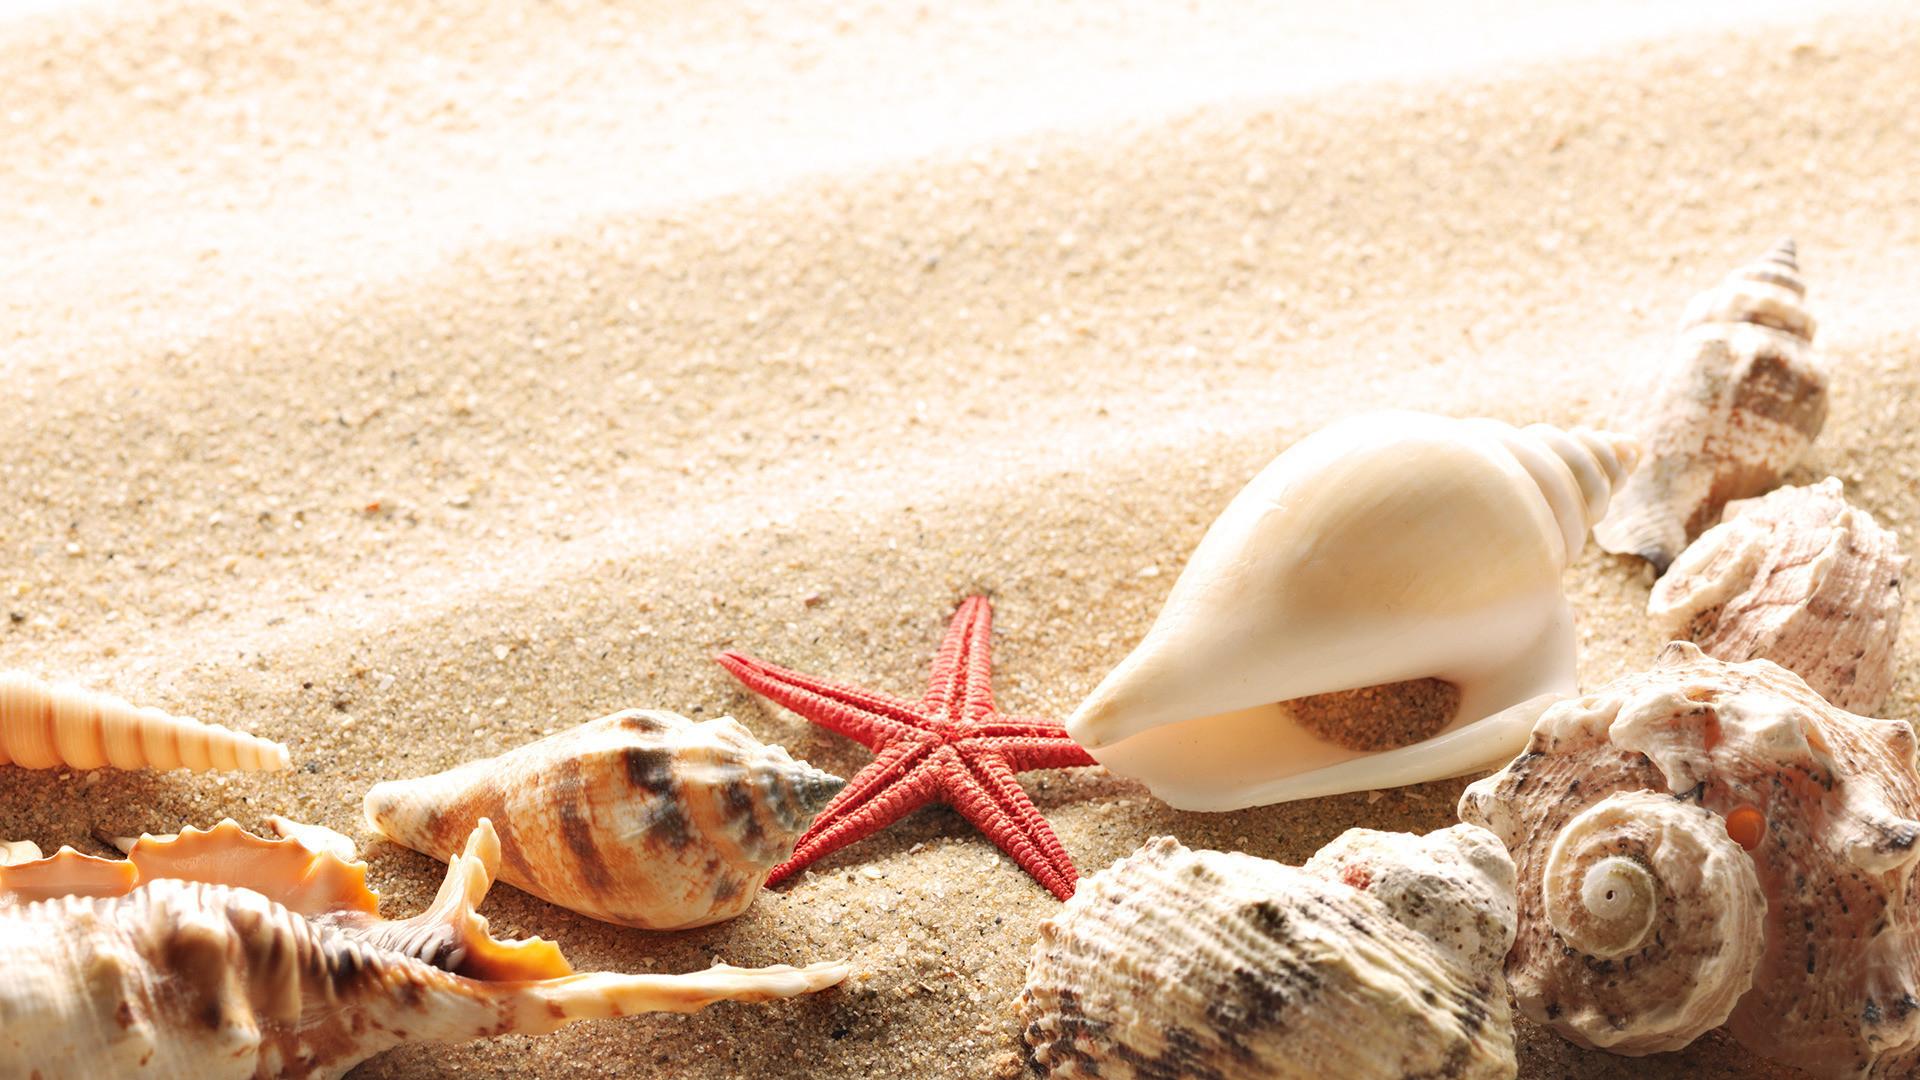 Res: 1920x1080, Wallpaper-seashells-summer-beach-sand-sun-theme -macro-download-132777-.jpg